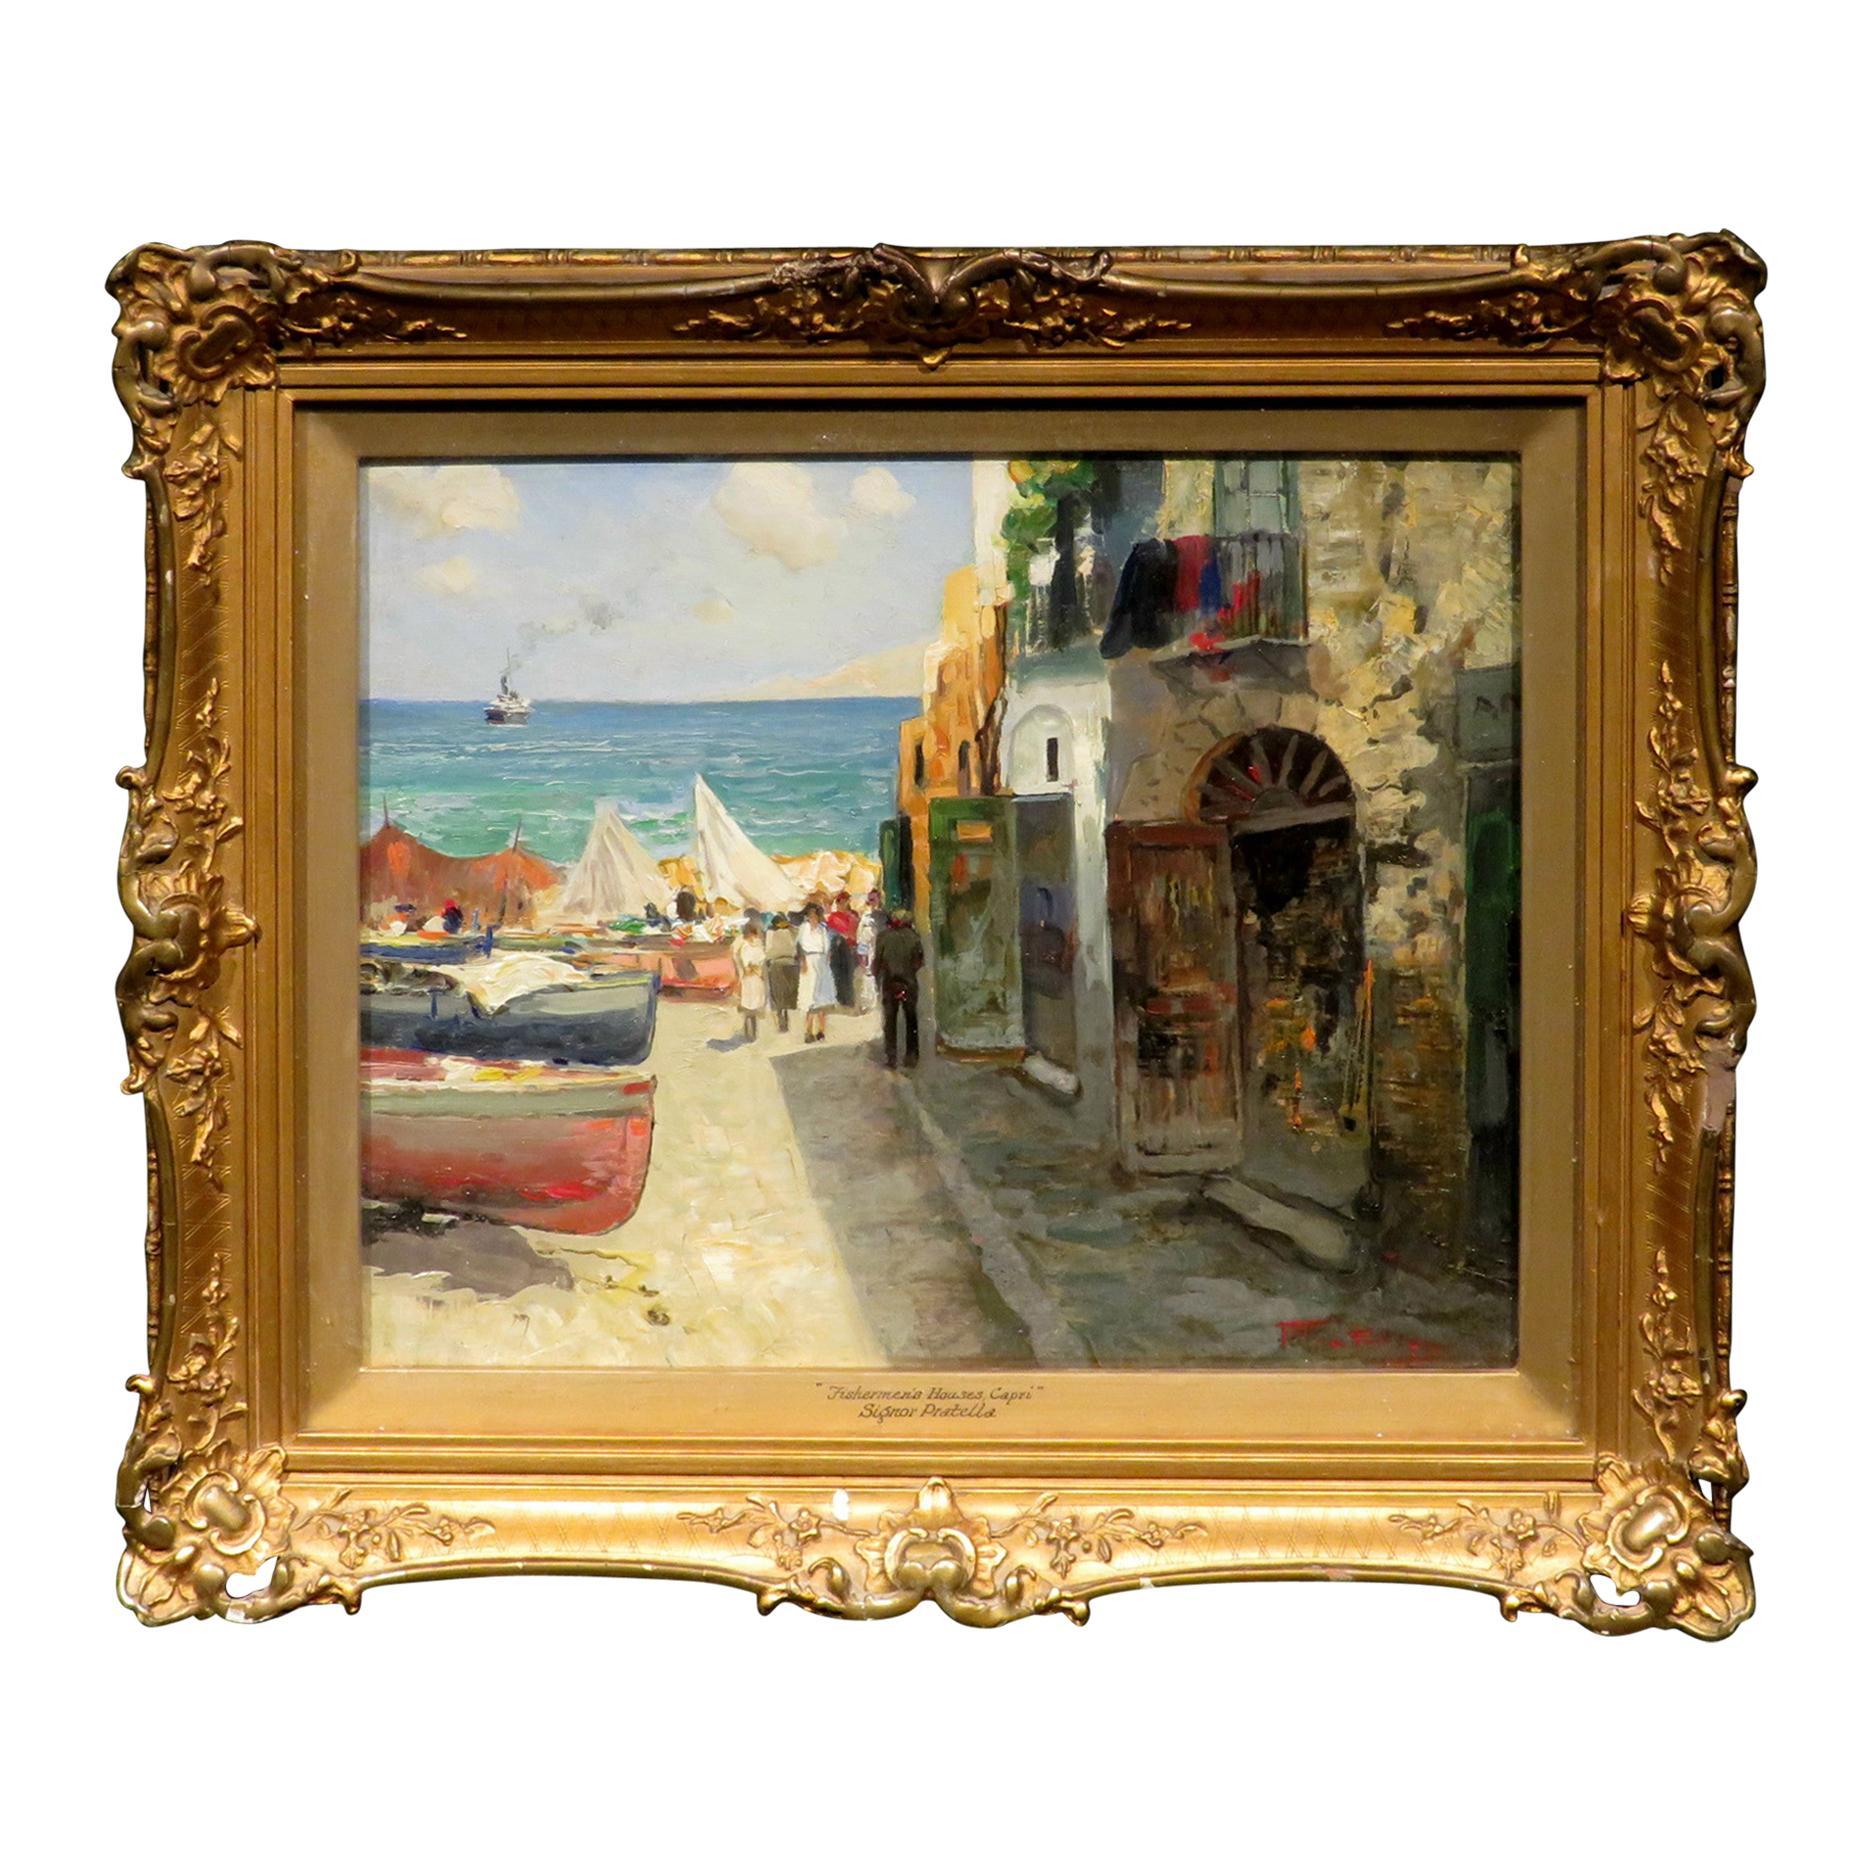 Impressionist Italian Coastal Landscape by Paolo Pratella (1892-1980)